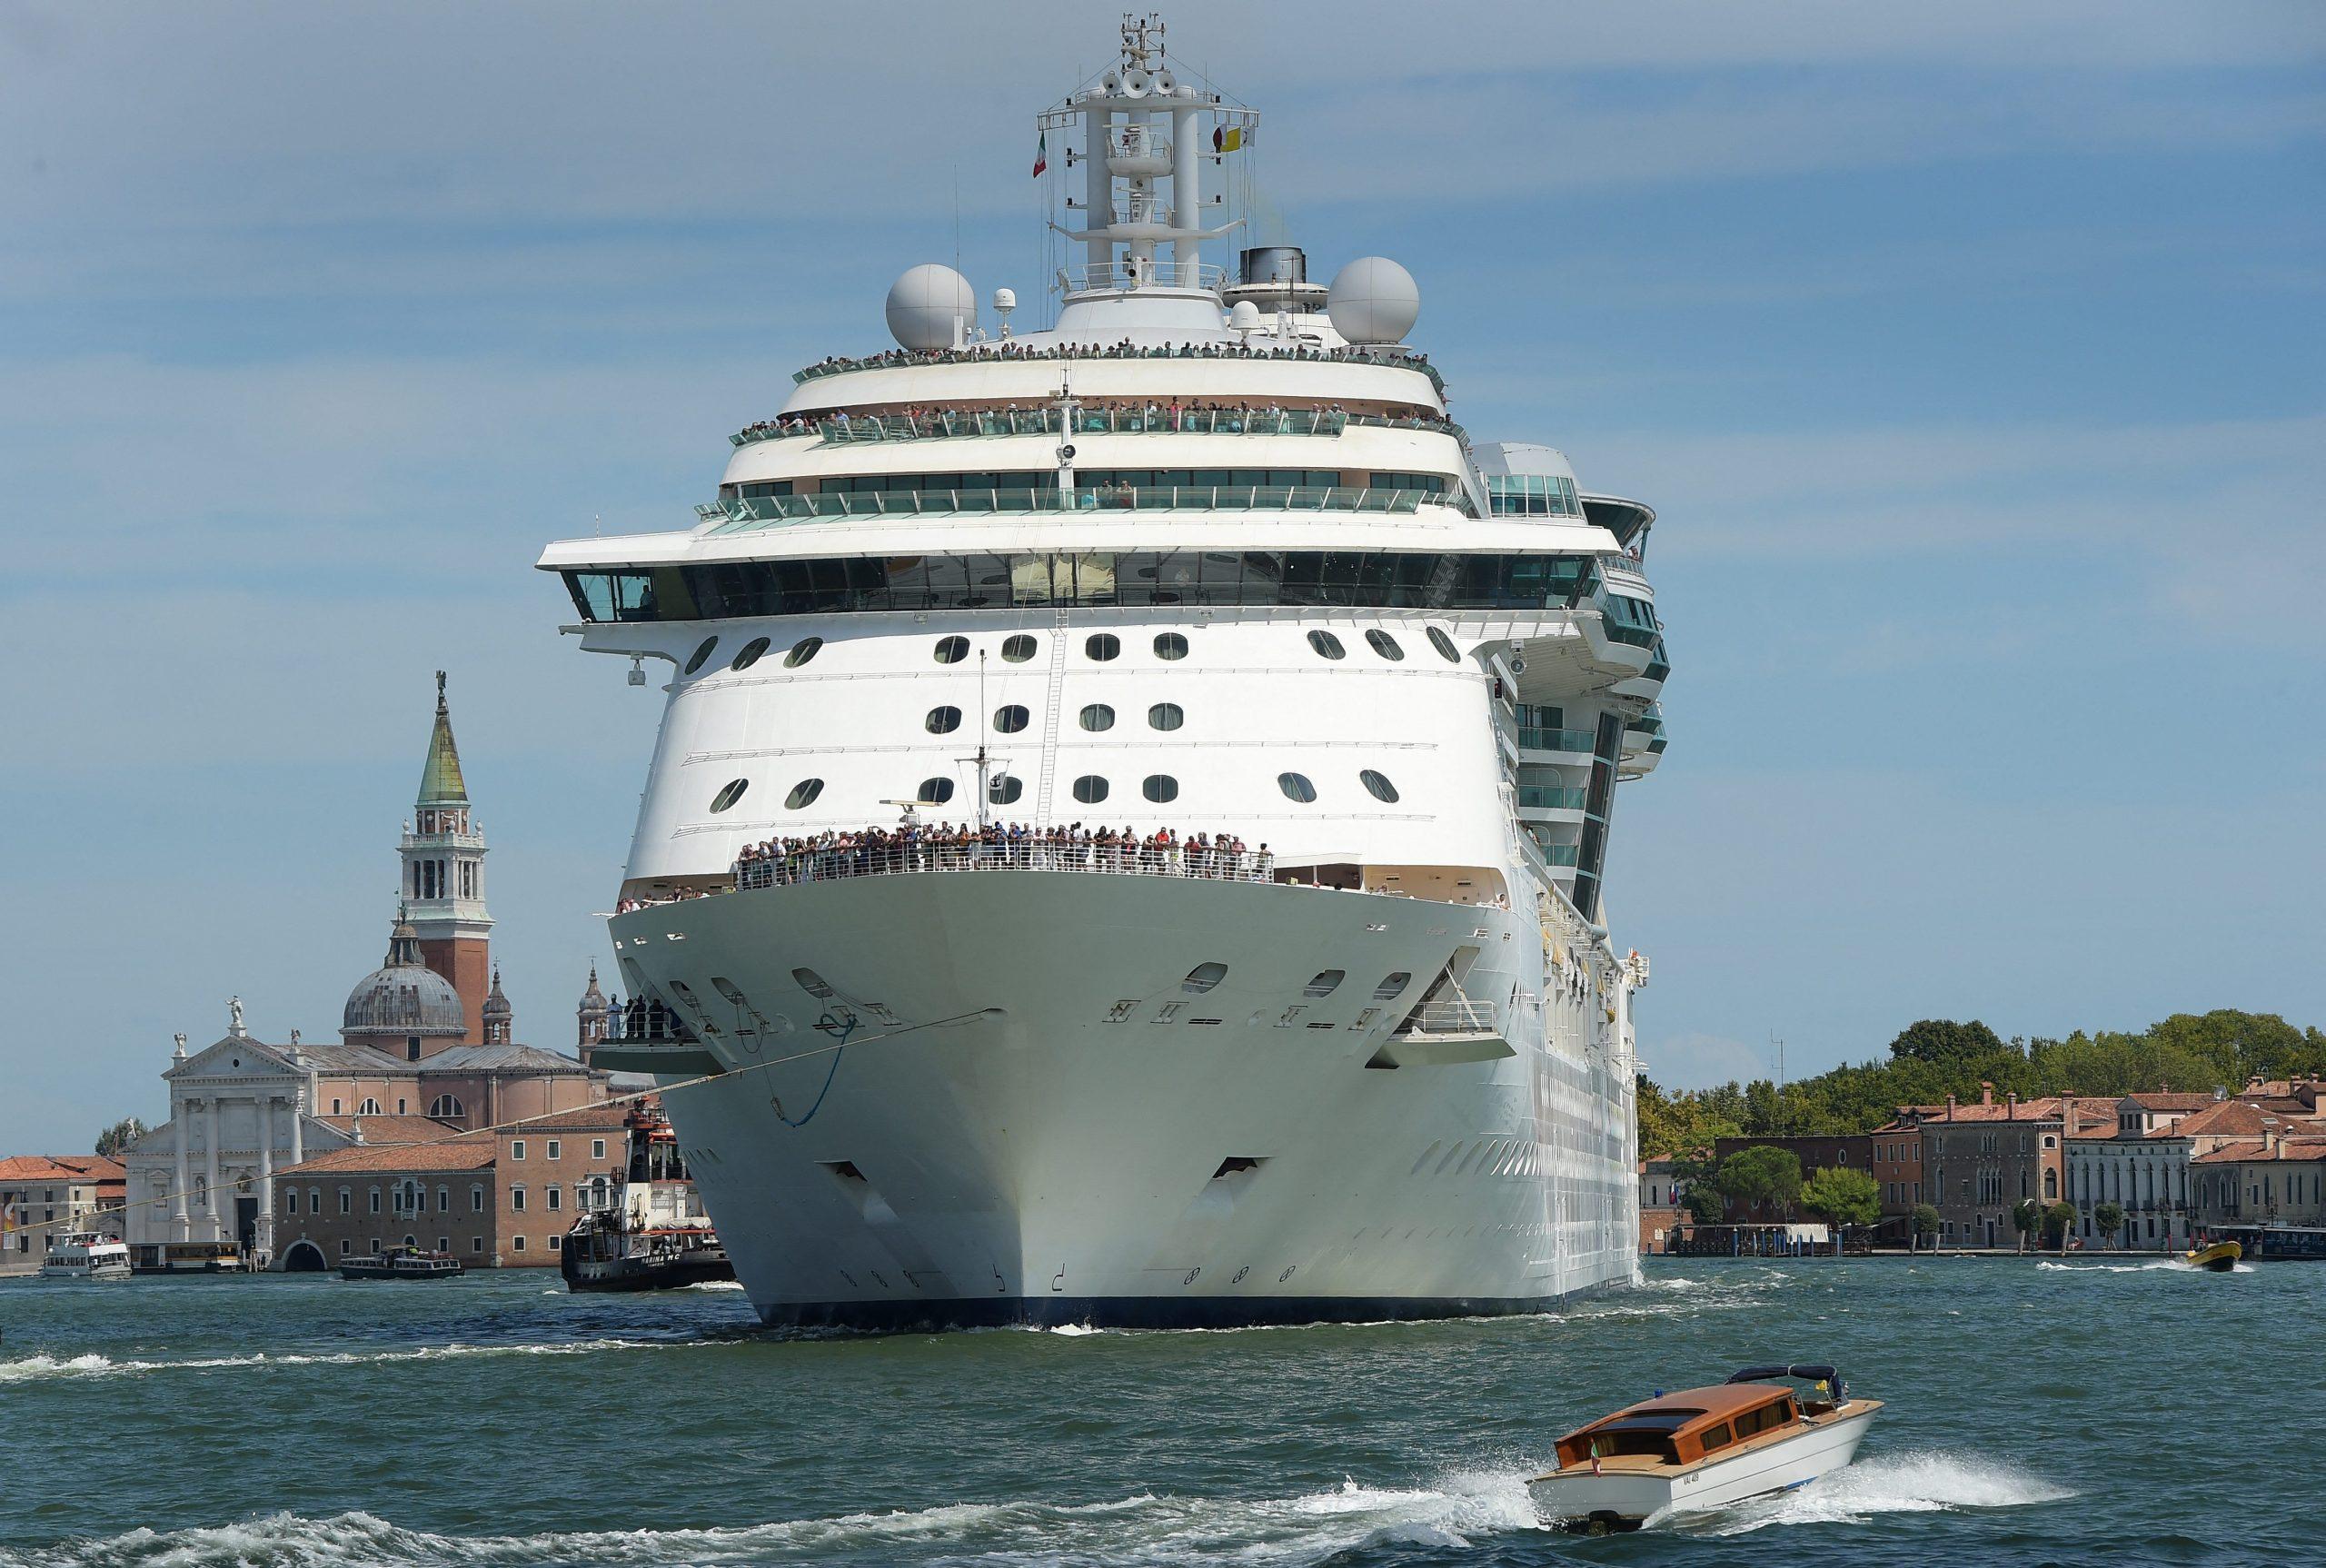 Coronavirus: MSC Cruises ship finally returns home after three months at sea